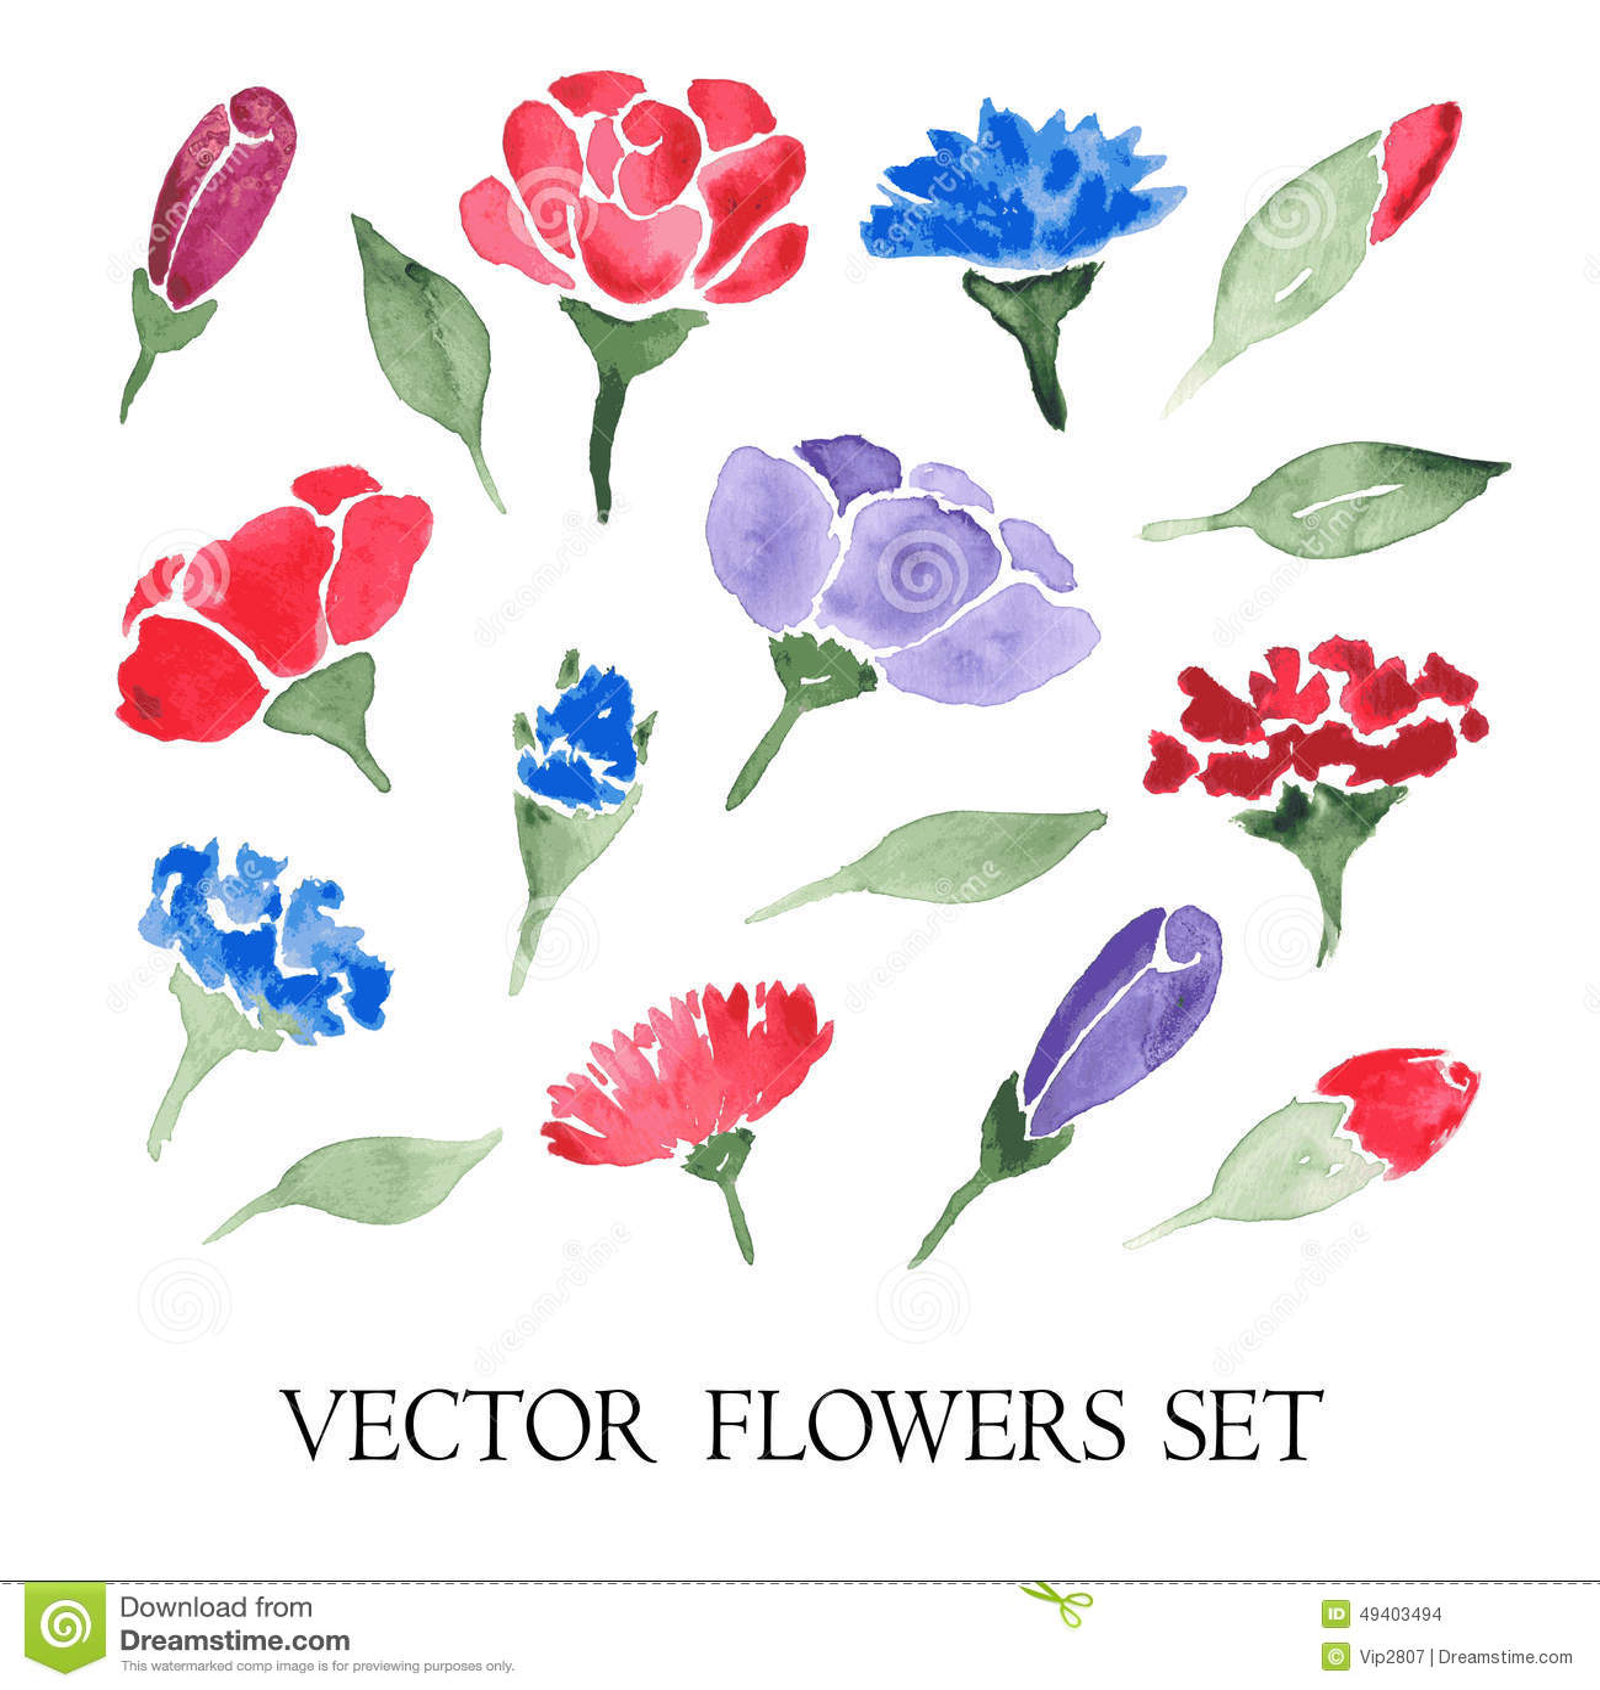 Download Vektorsatz Aquarellblumen vektor abbildung. Illustration von stieg - 49403494